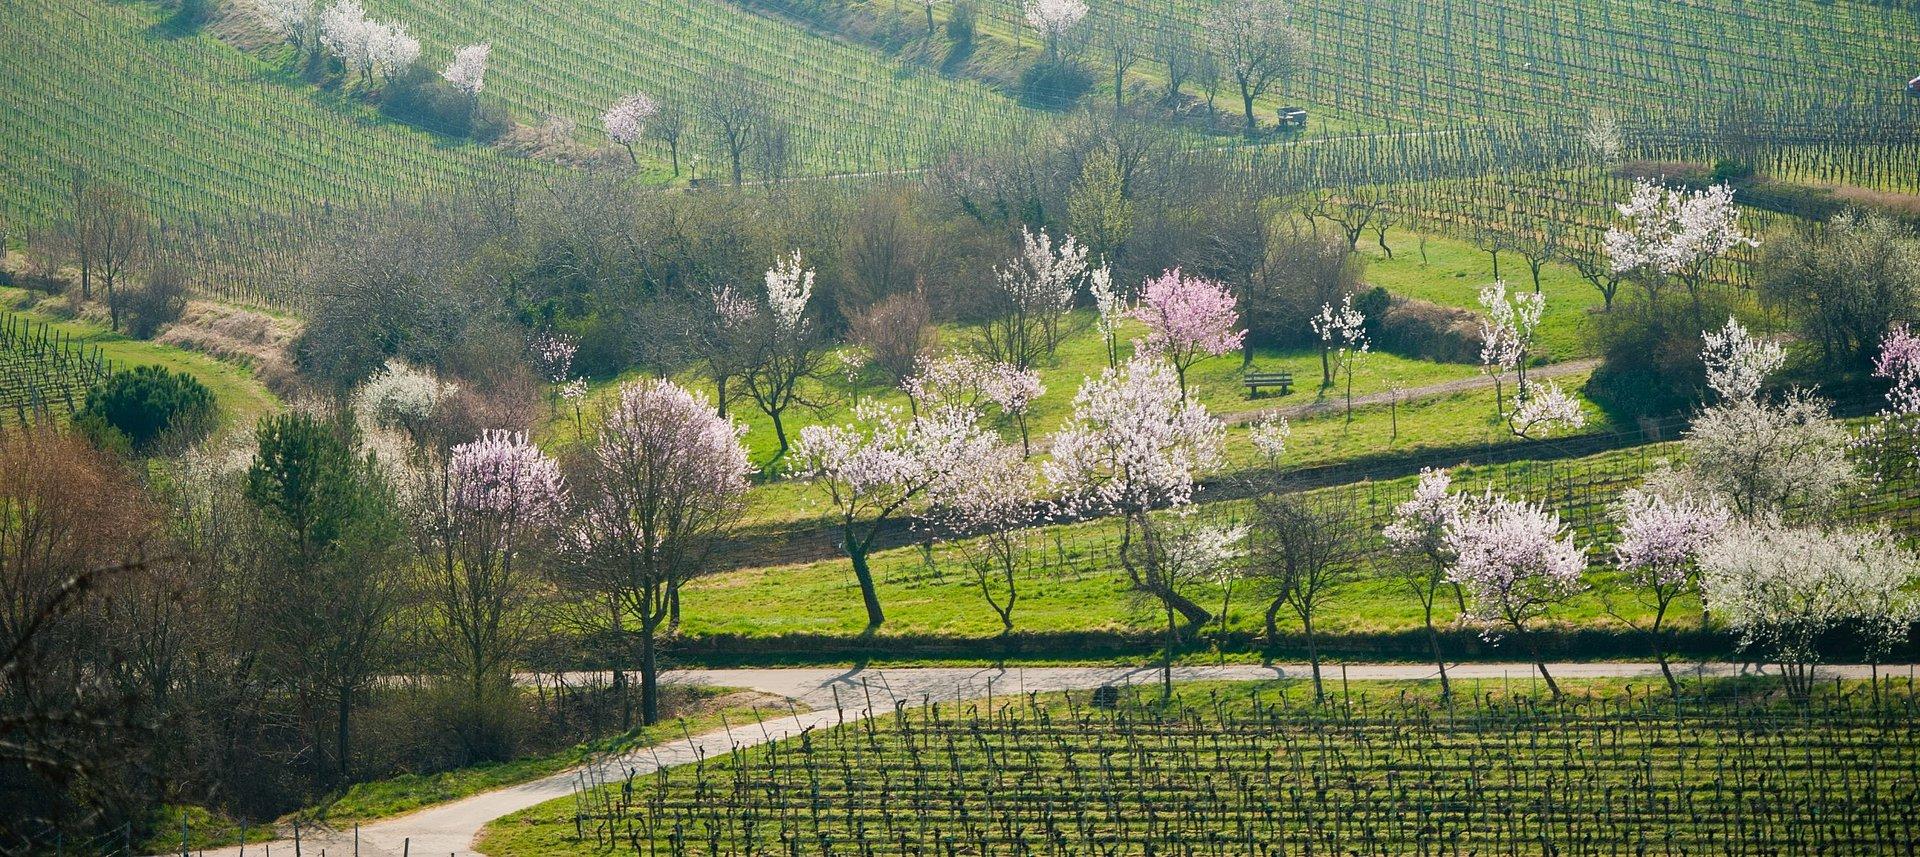 Blühende Mandelbäume bei Gimmeldingen, Pfalz